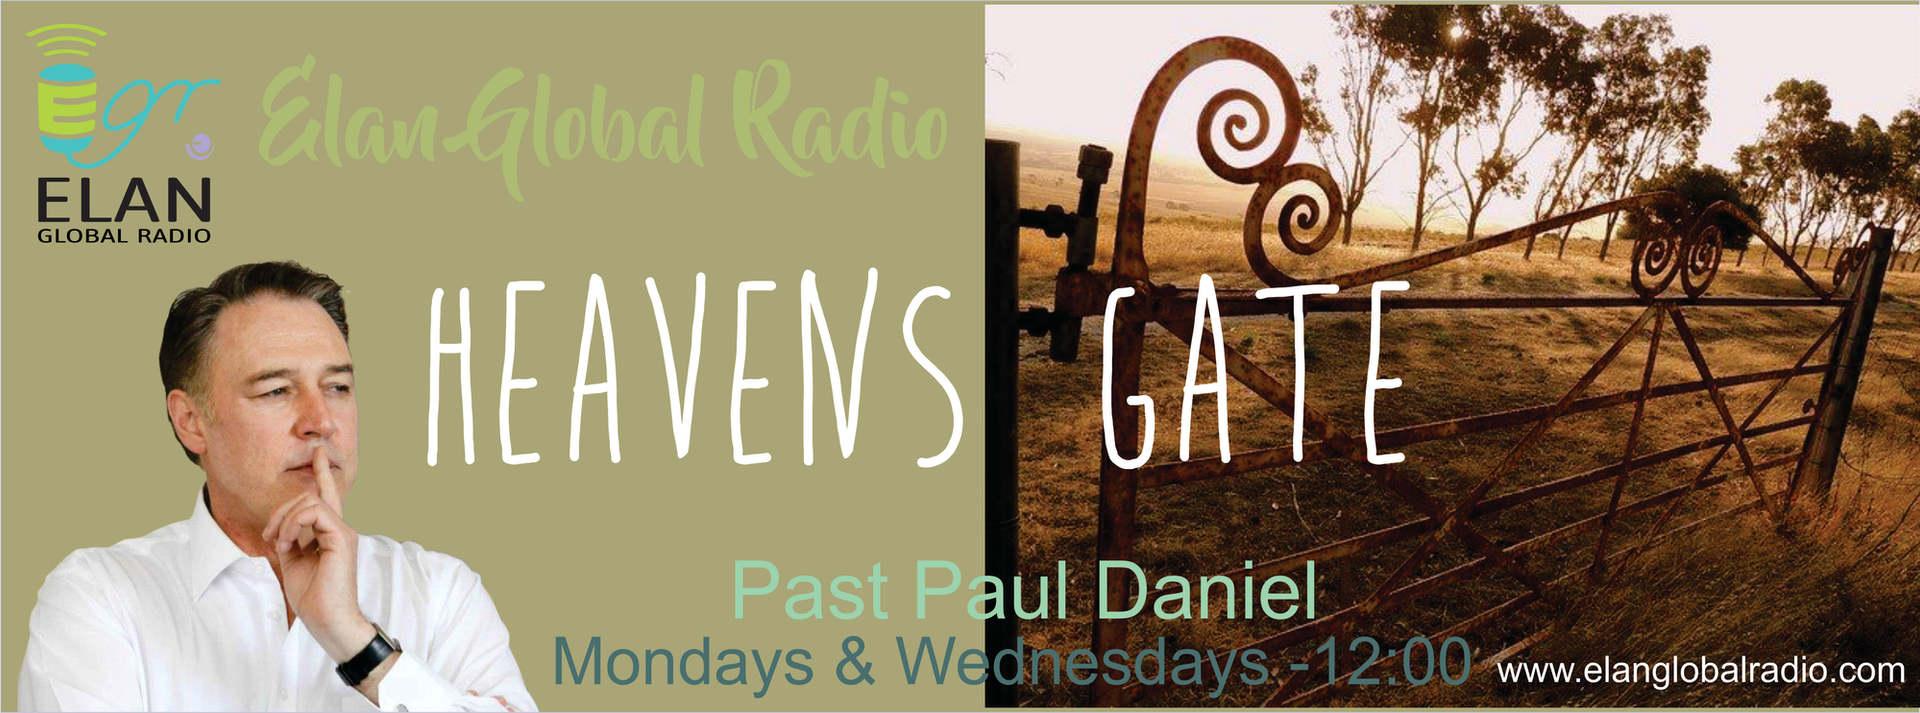 Heavens gate Past Paul Daniel.jpg